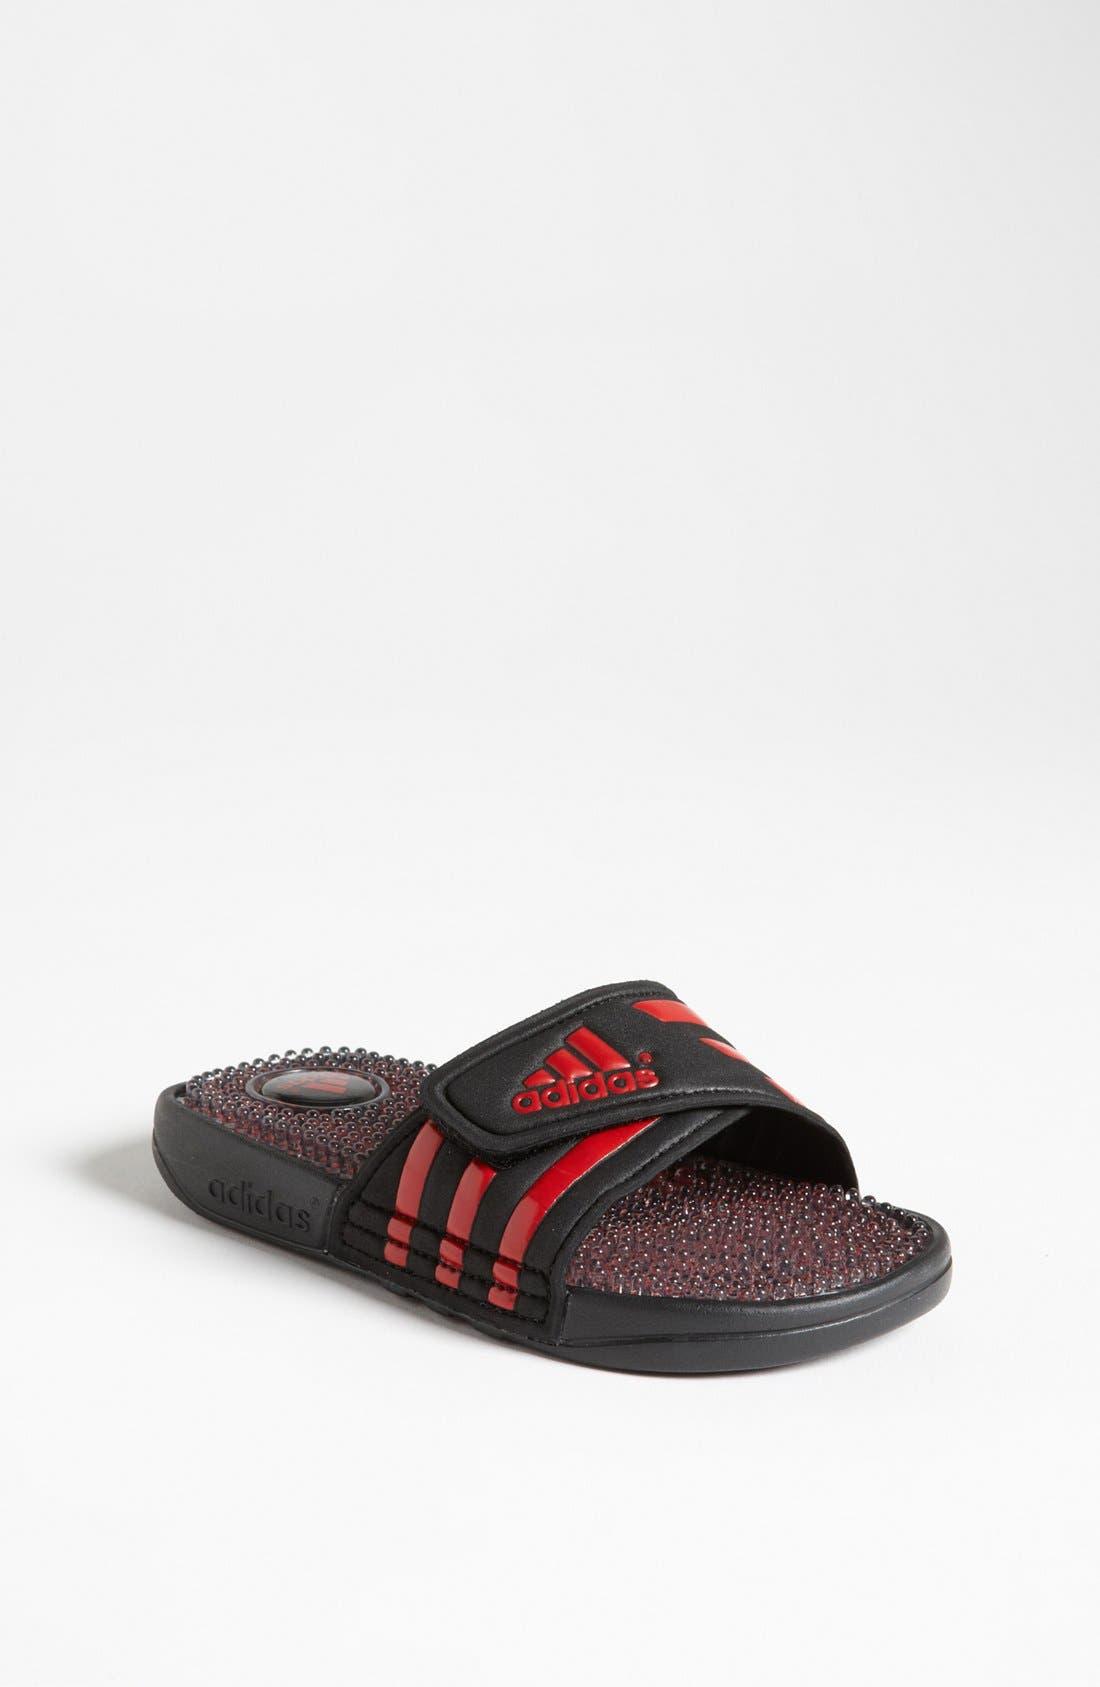 Main Image - adidas 'Adissage - Fade' Sandal (Toddler, Little Kid & Big Kid)